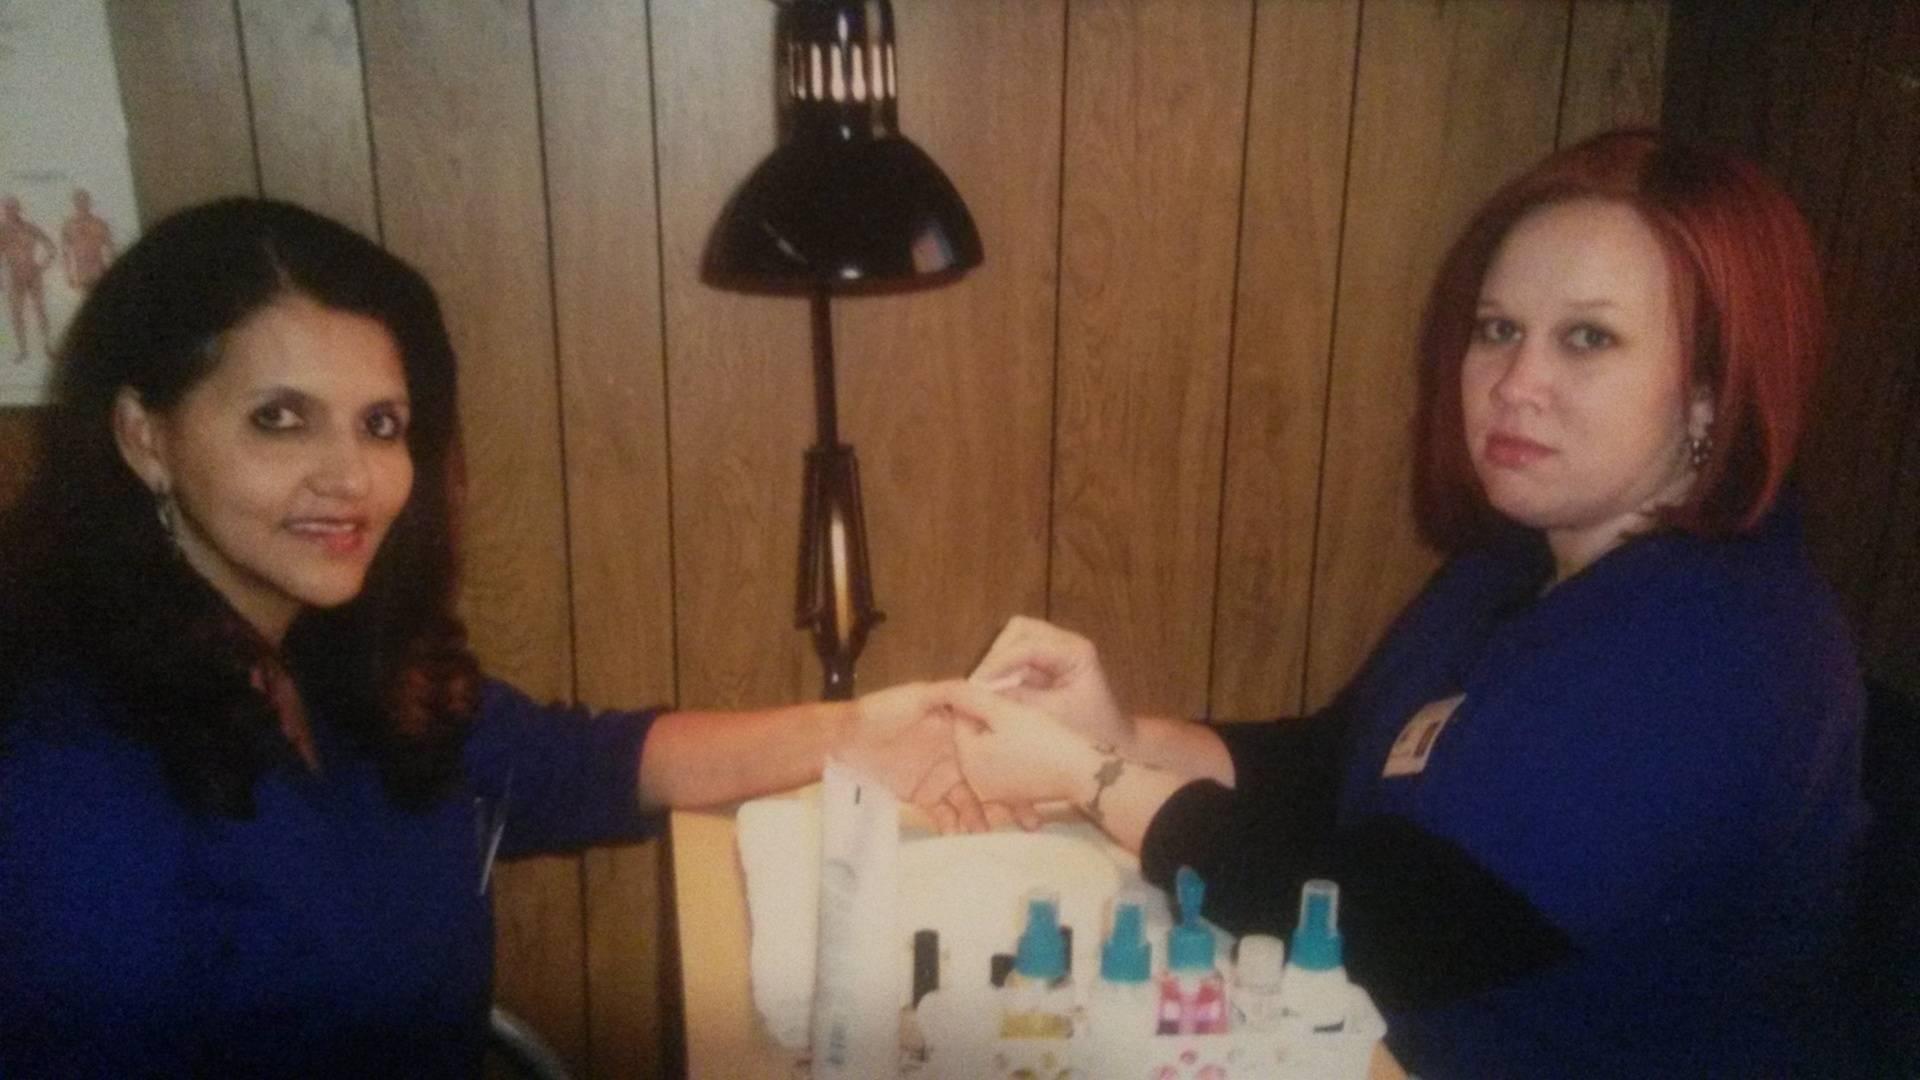 Student providing a manicure